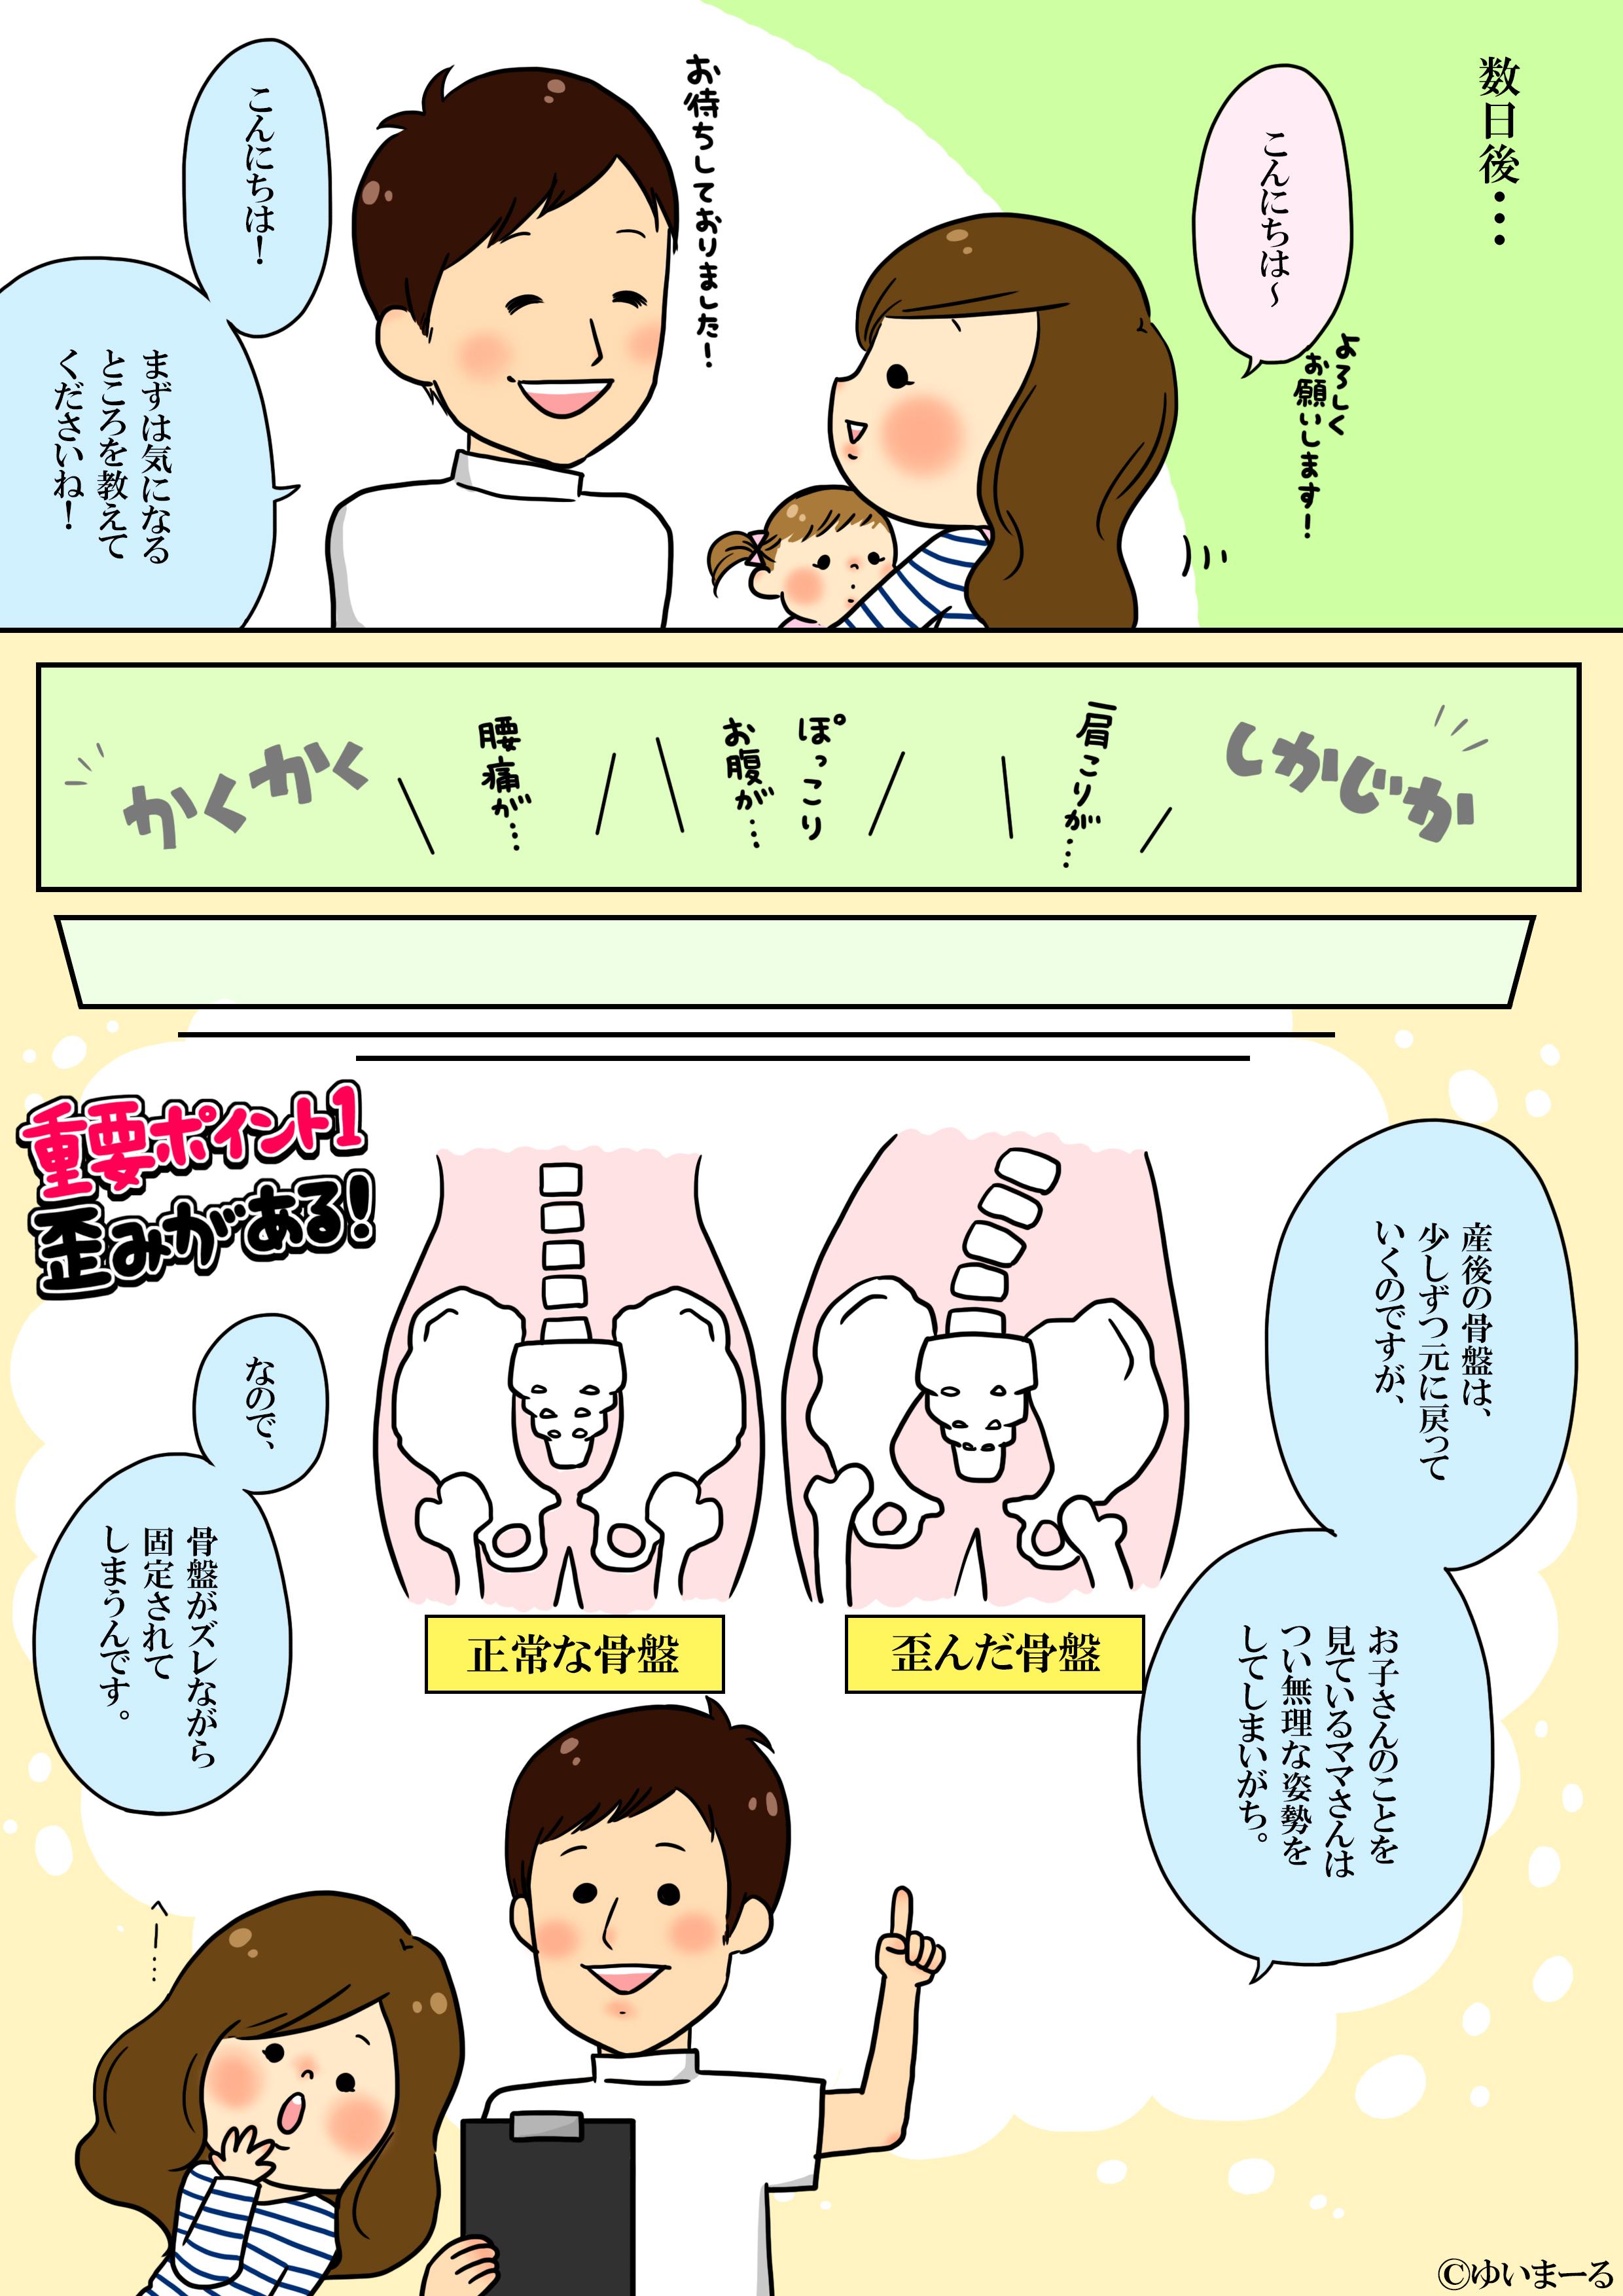 産後の骨盤矯正漫画2